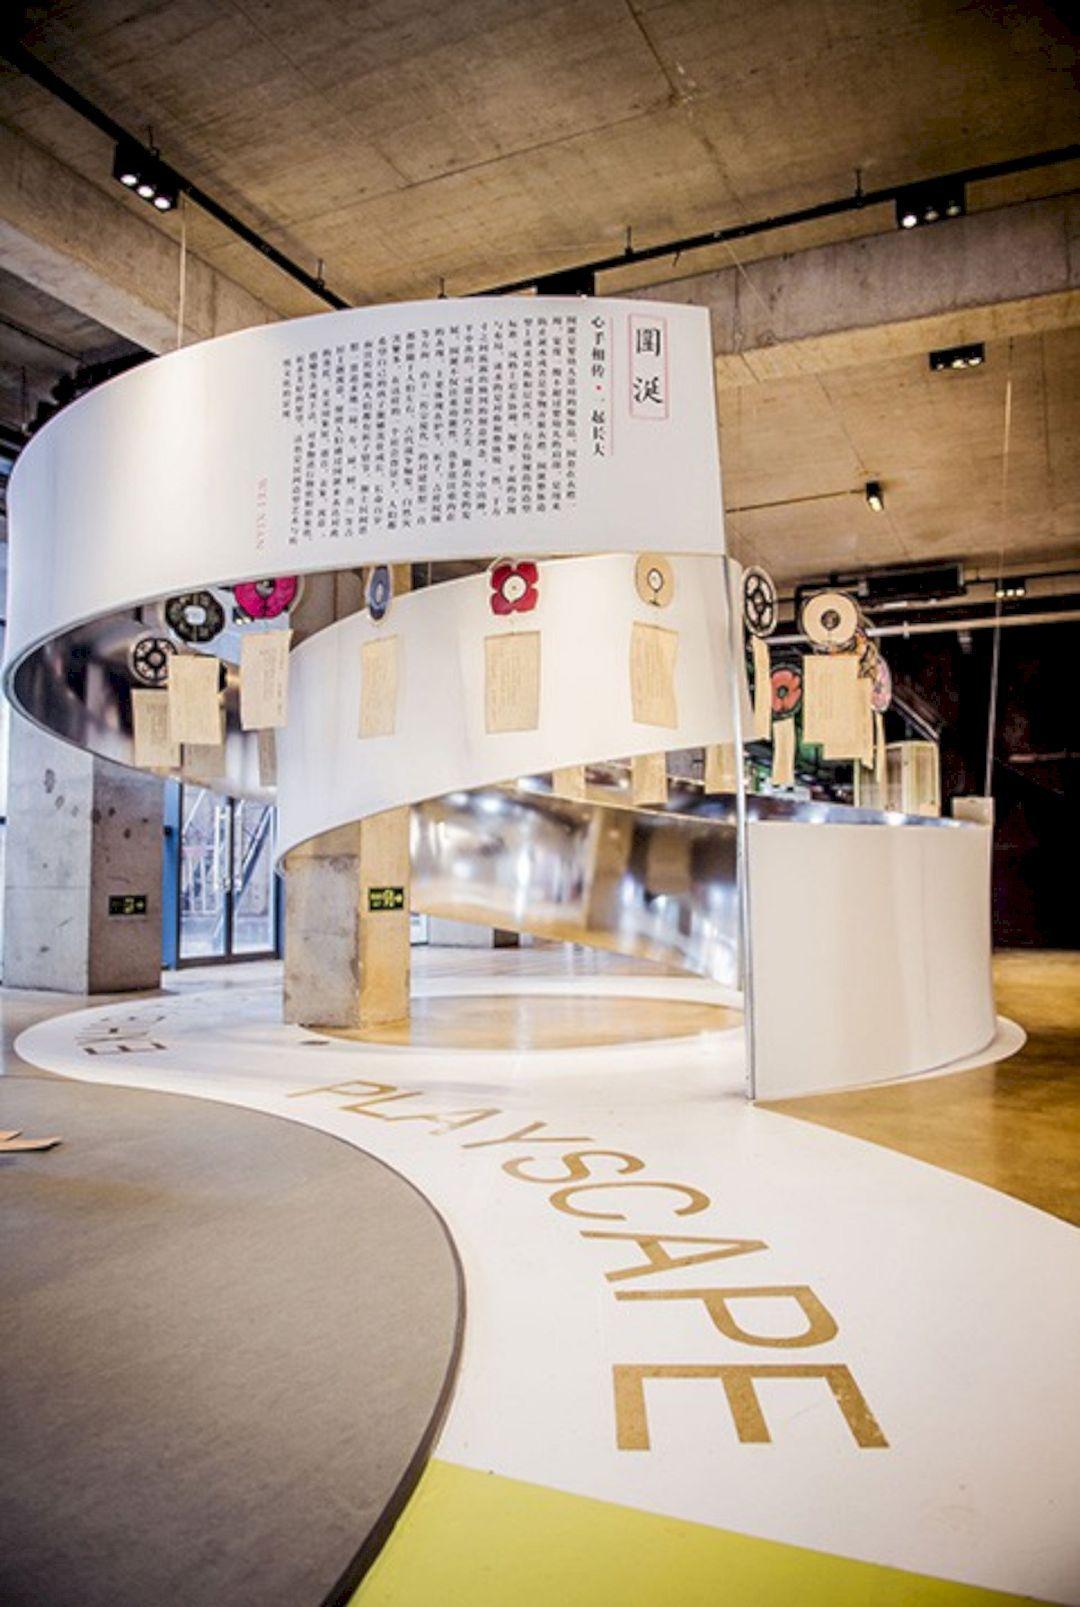 Exhibition Space Design